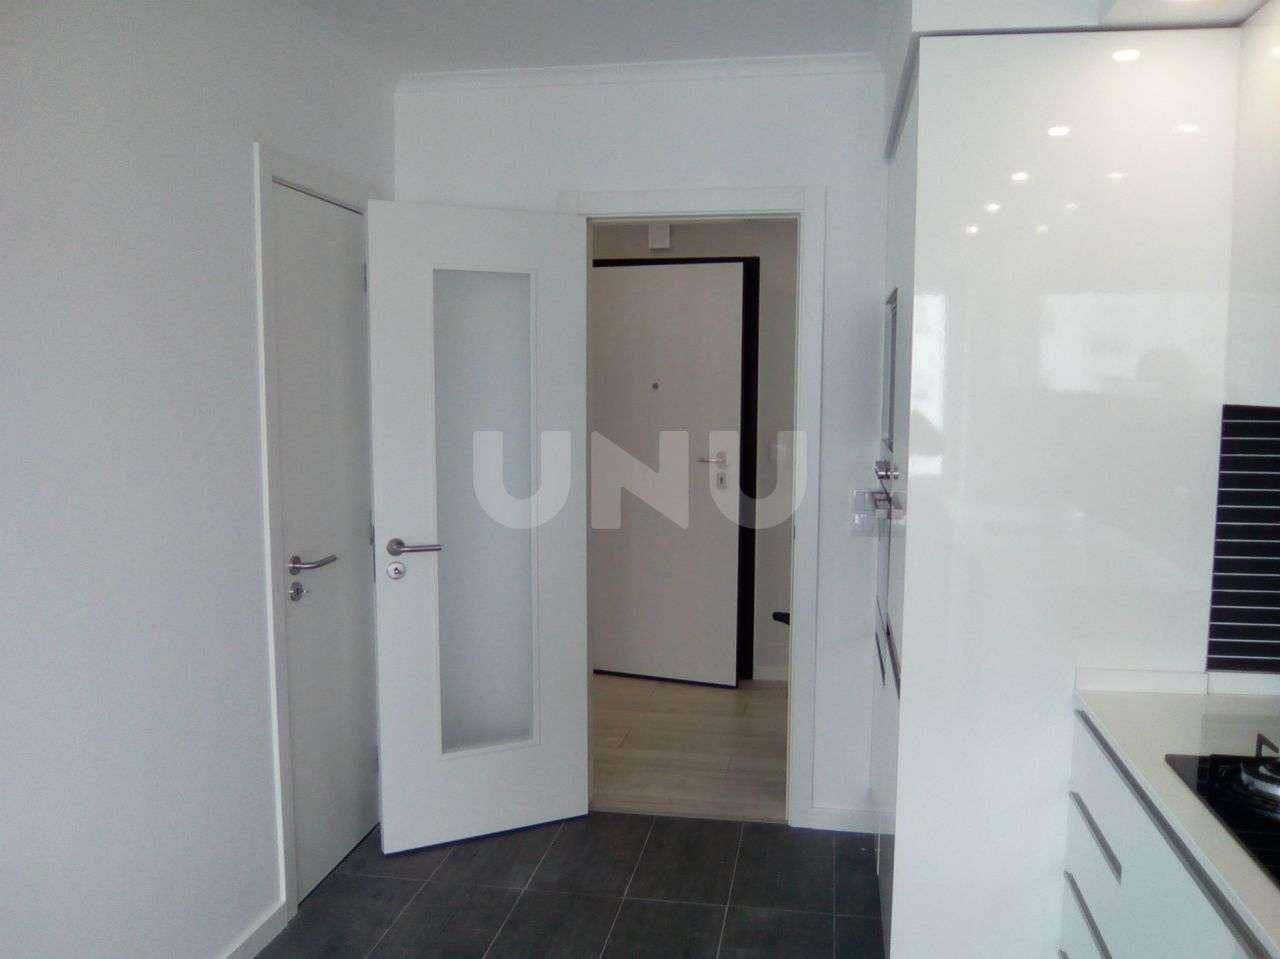 Apartamento para comprar, Barcarena, Lisboa - Foto 13